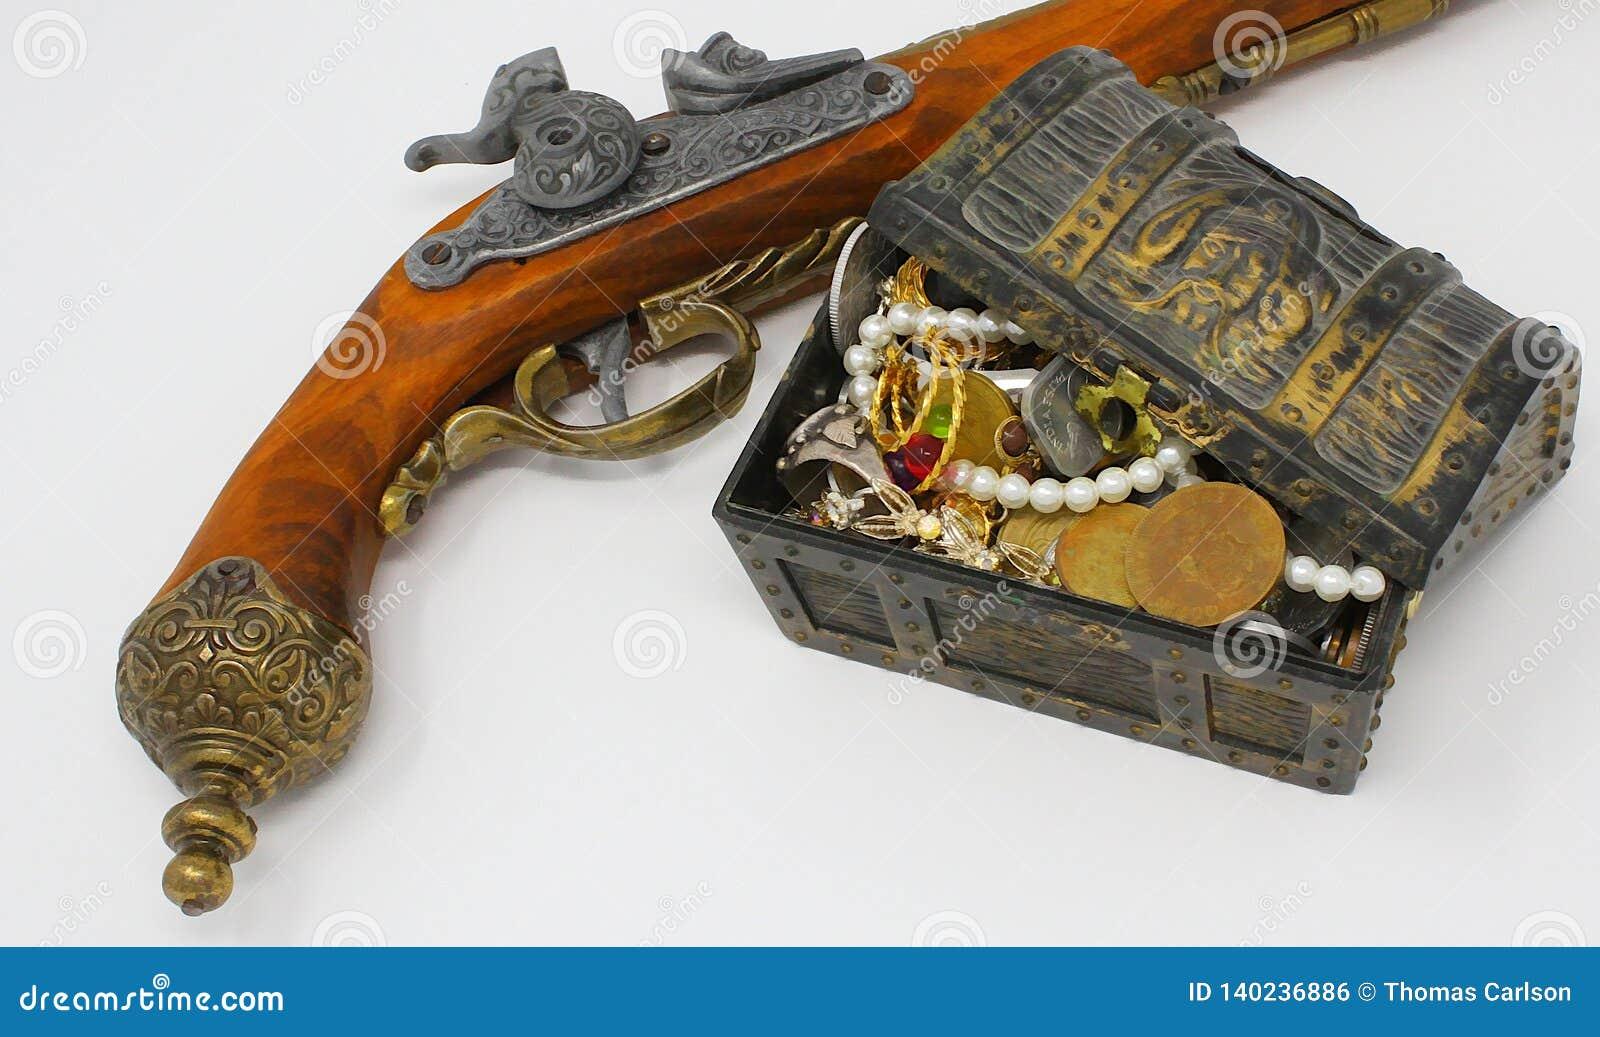 Pirate Treasure with Pistol Gun